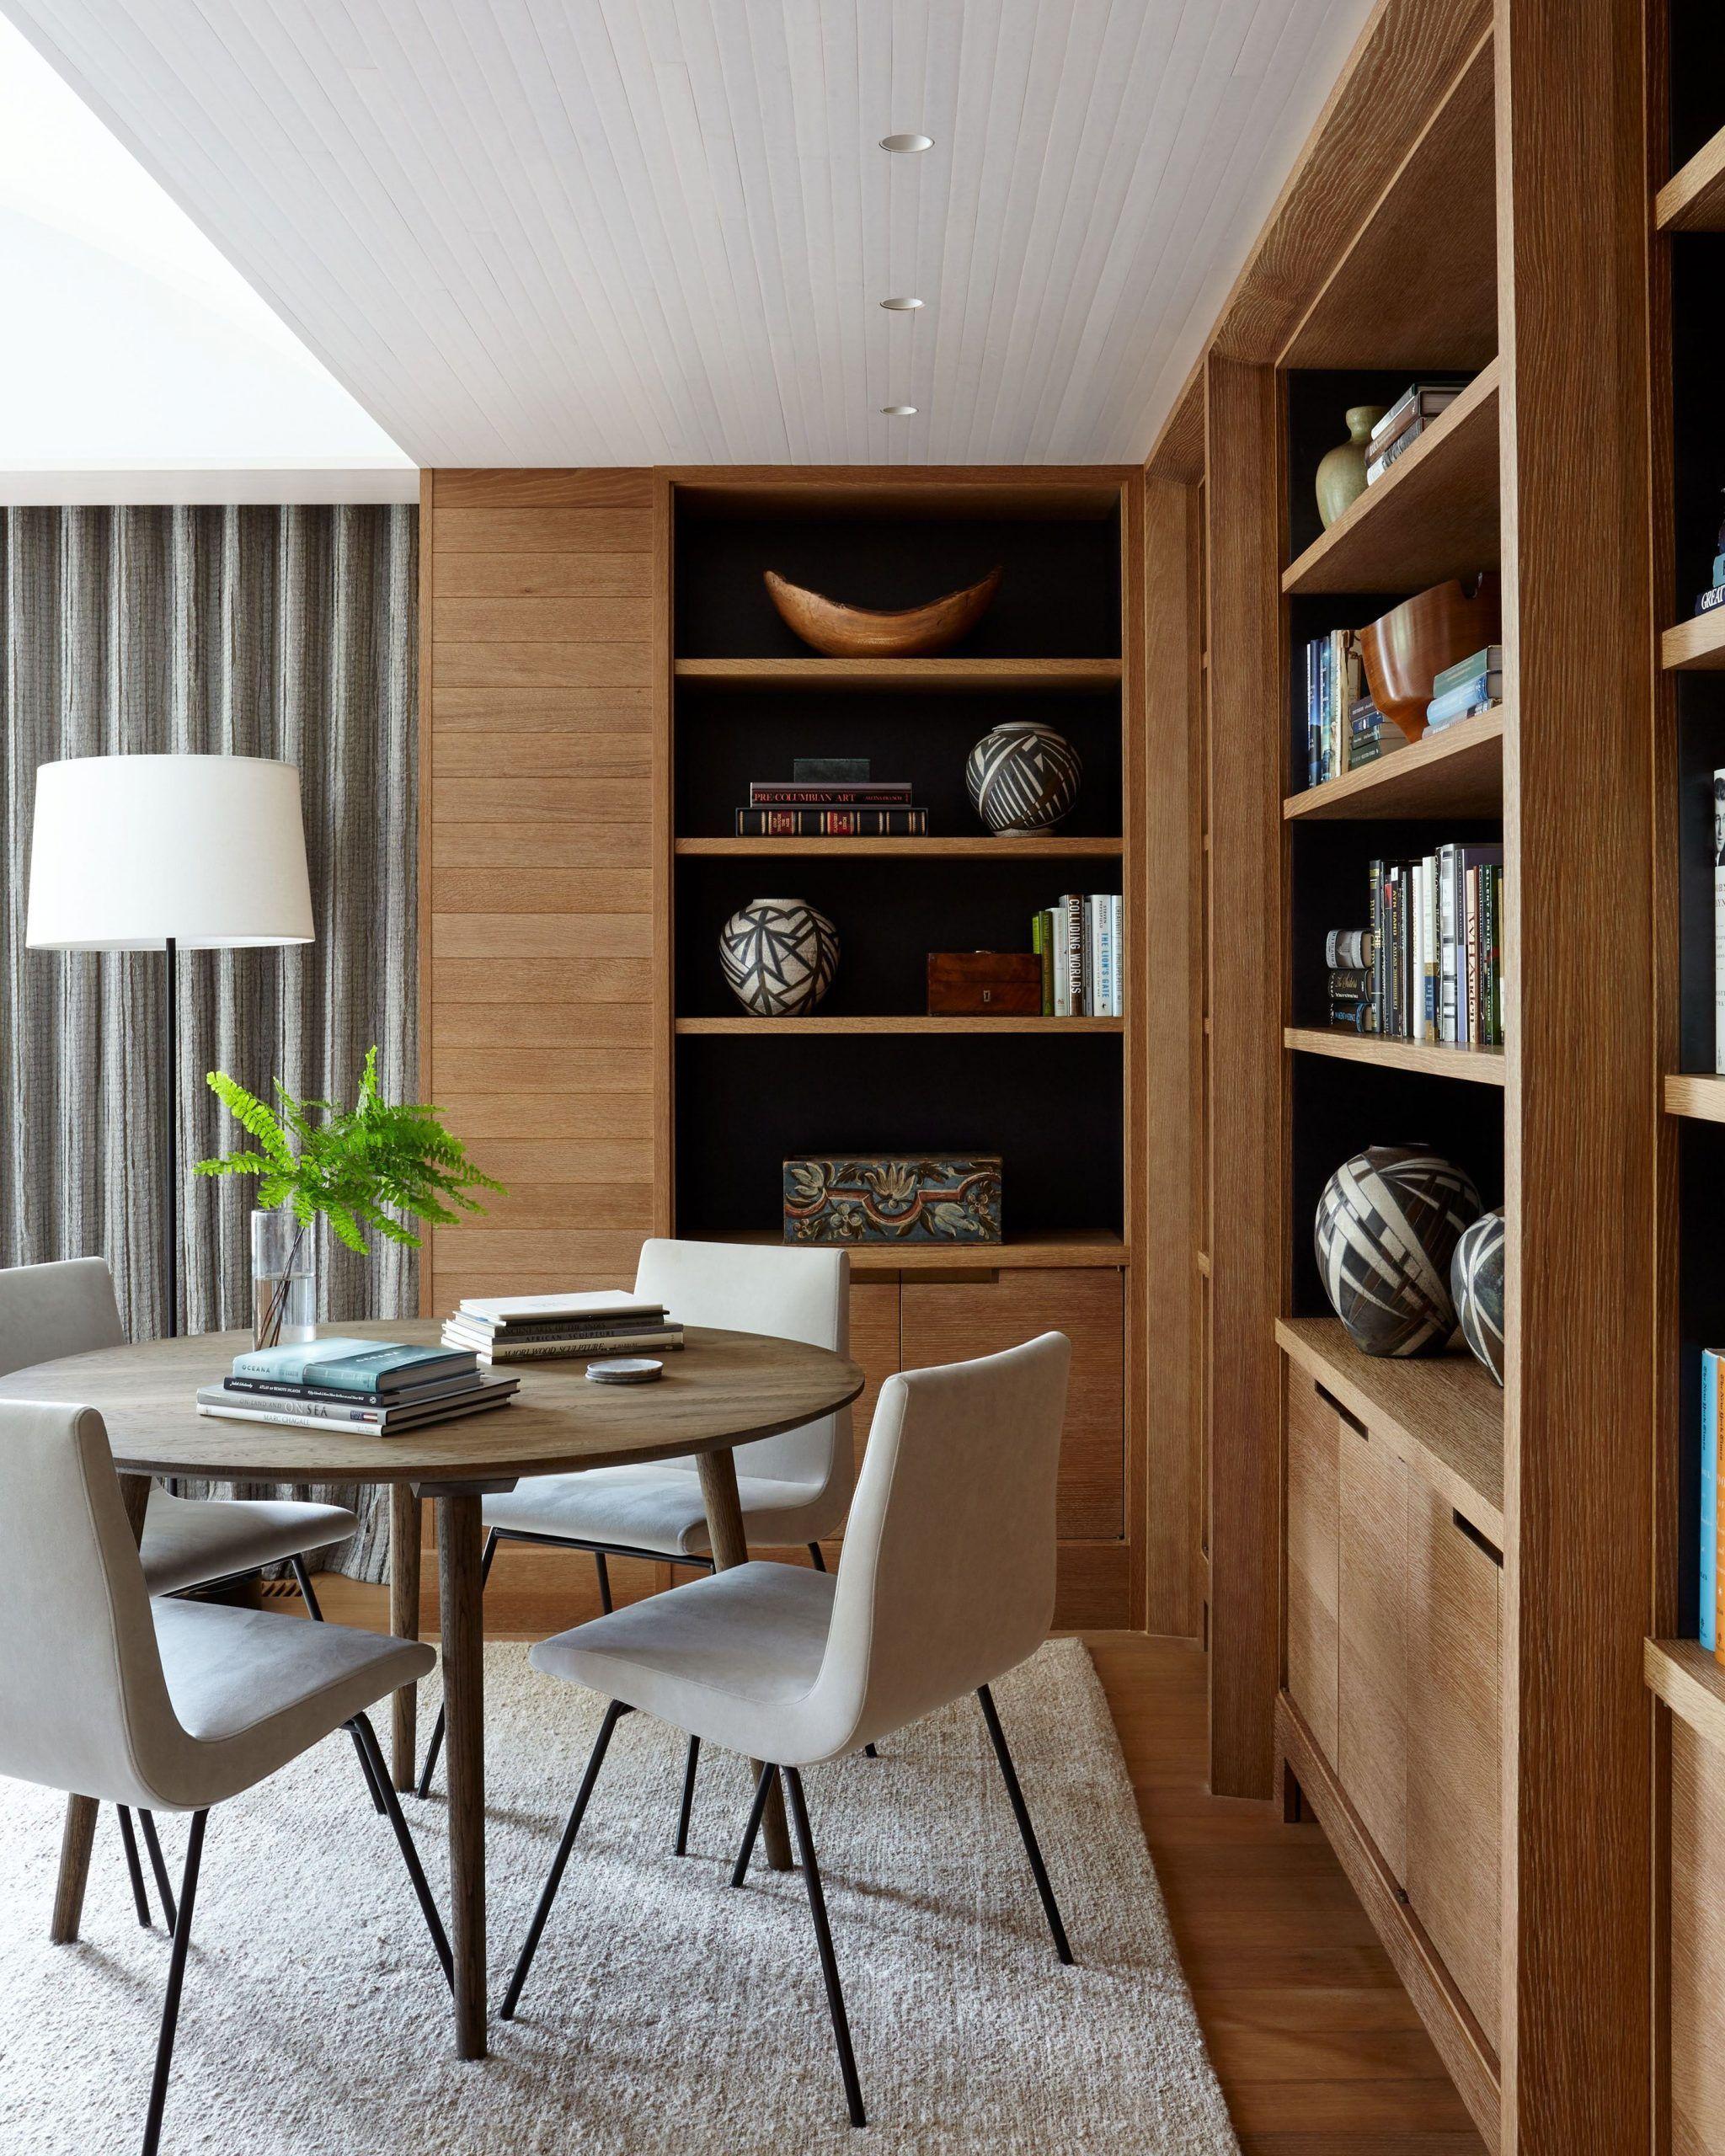 Wood Paneled Library: Minimalist Contemporary Scandinavian Style Custom Wood